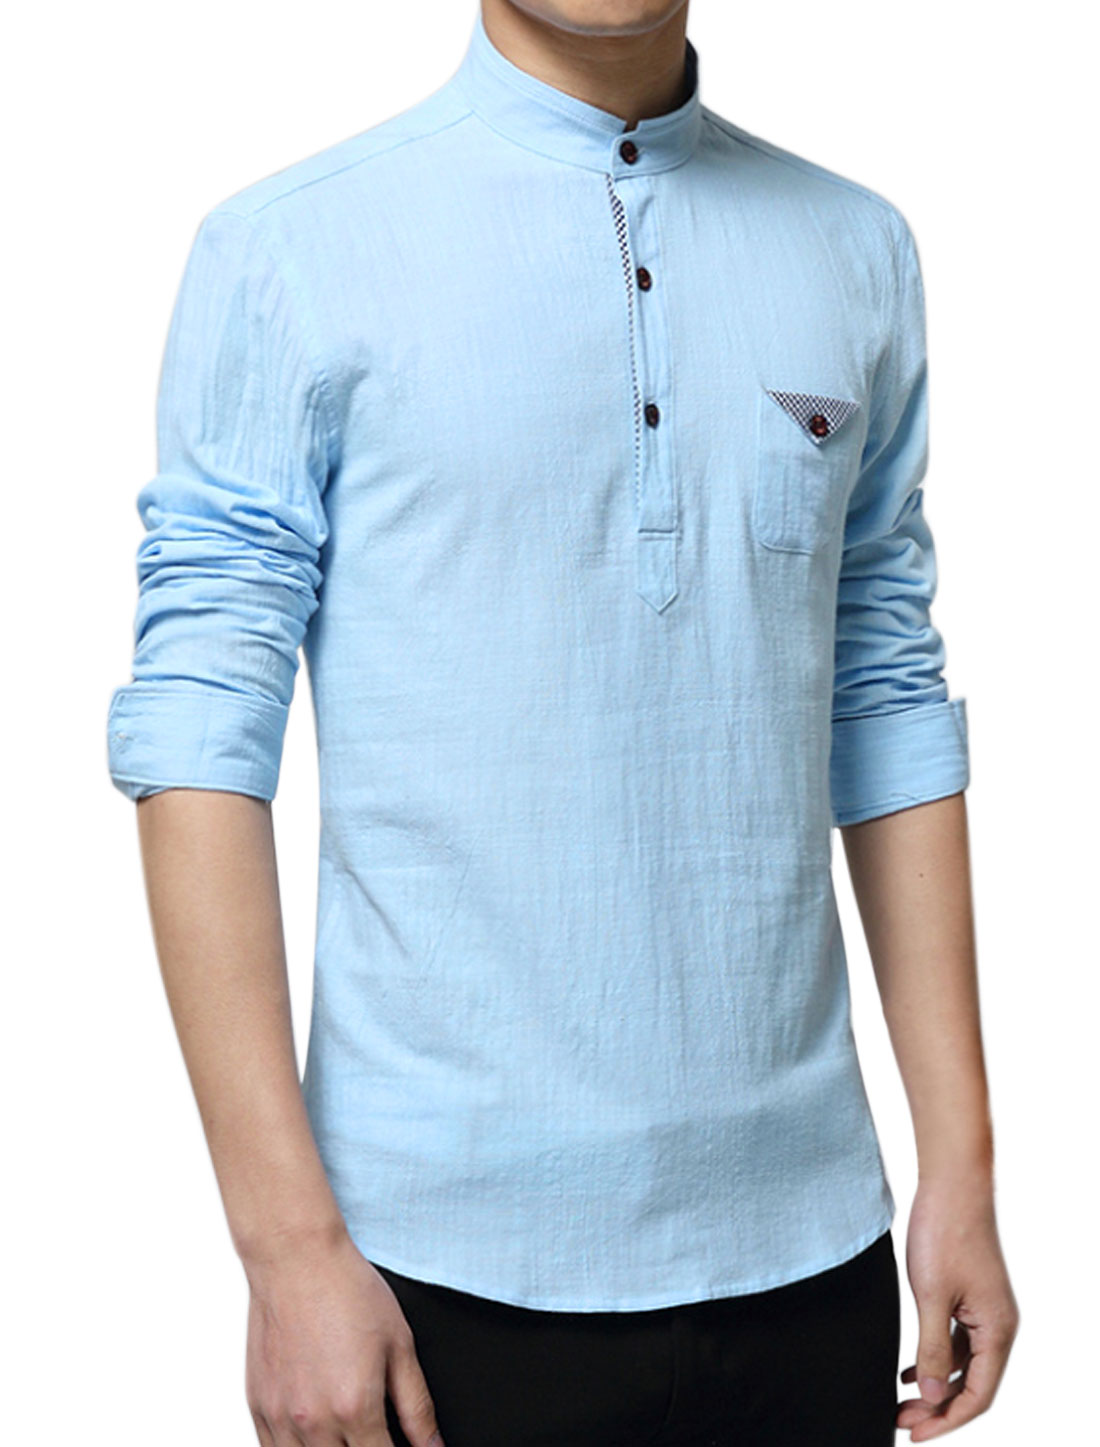 Men Mandarin Collar One Pocket Buttoned Slim Fit Shirt Sky Blue M